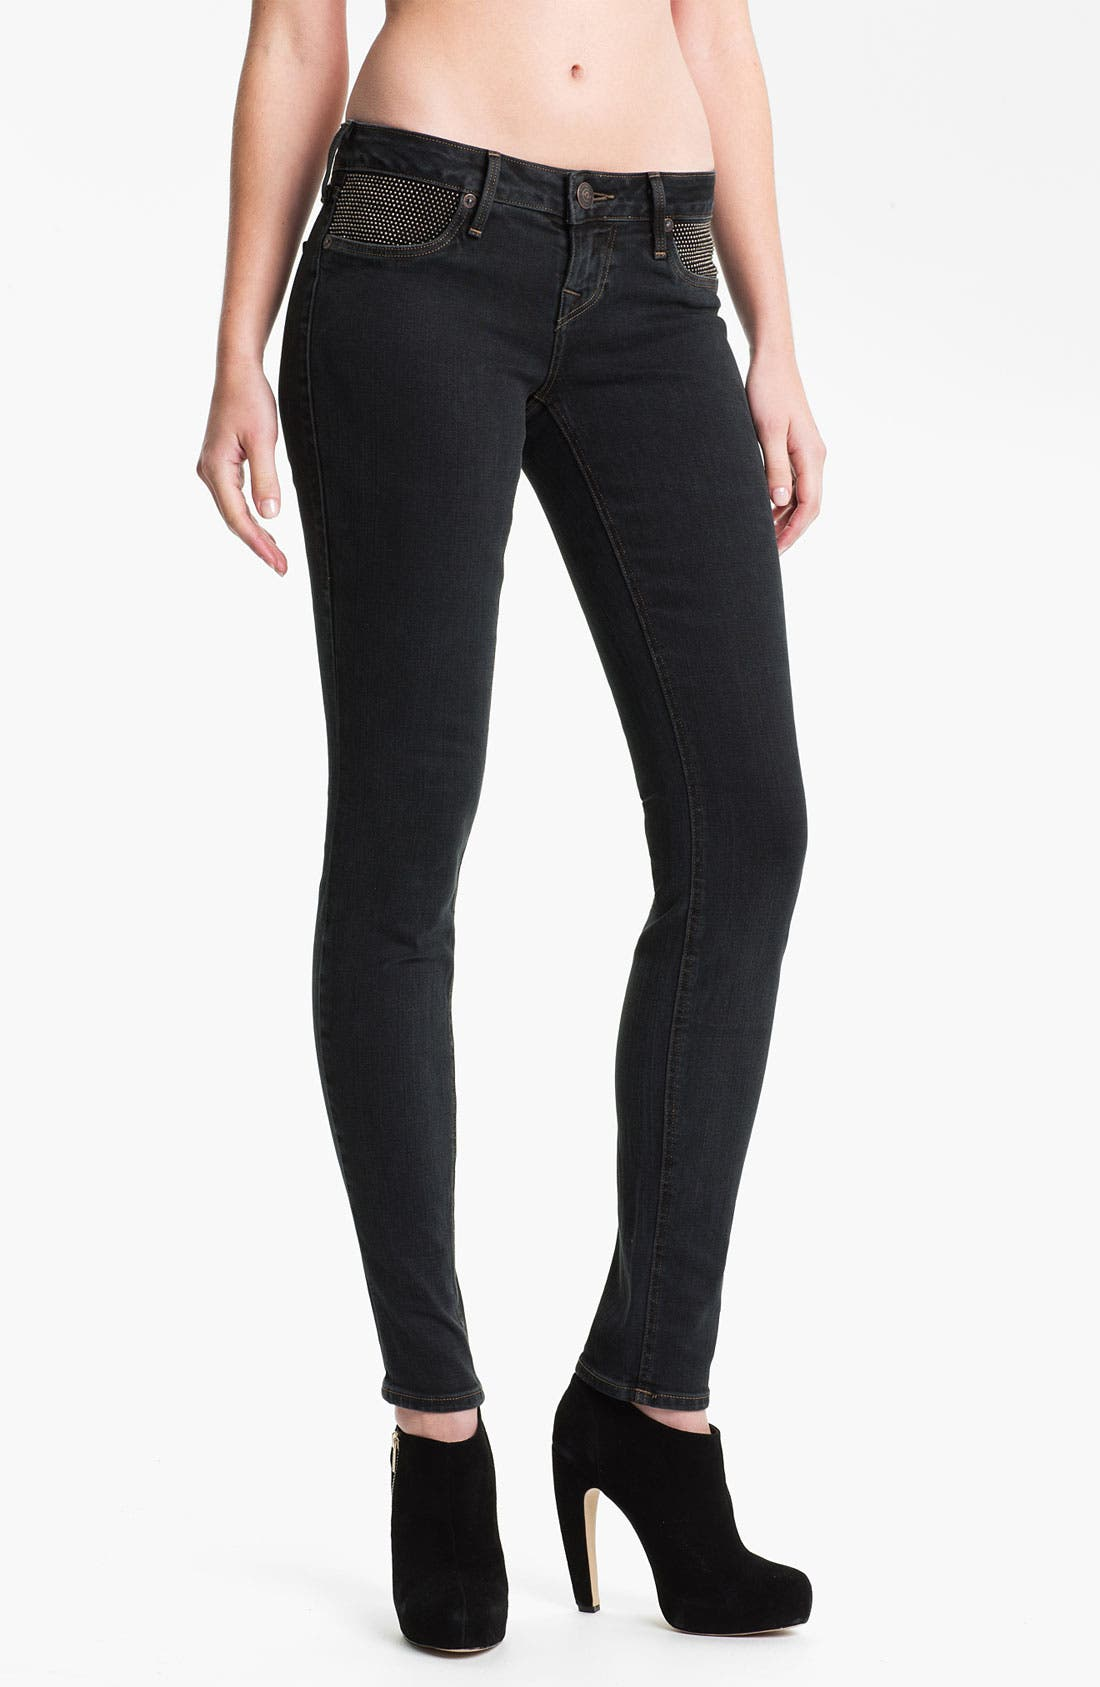 Alternate Image 1 Selected - True Religion Brand Jeans 'Shannon' Studded Pocket Skinny Jeans (Black Stone)